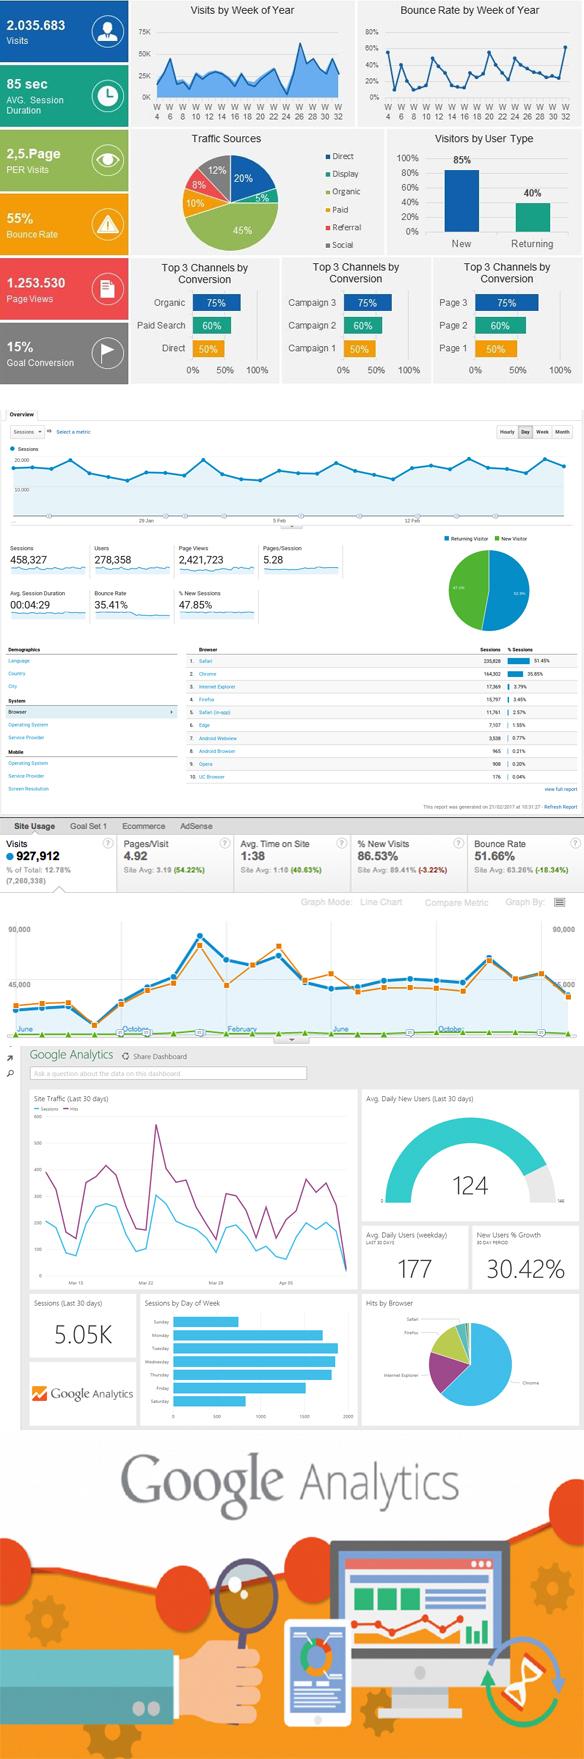 Google Analyttics graphics